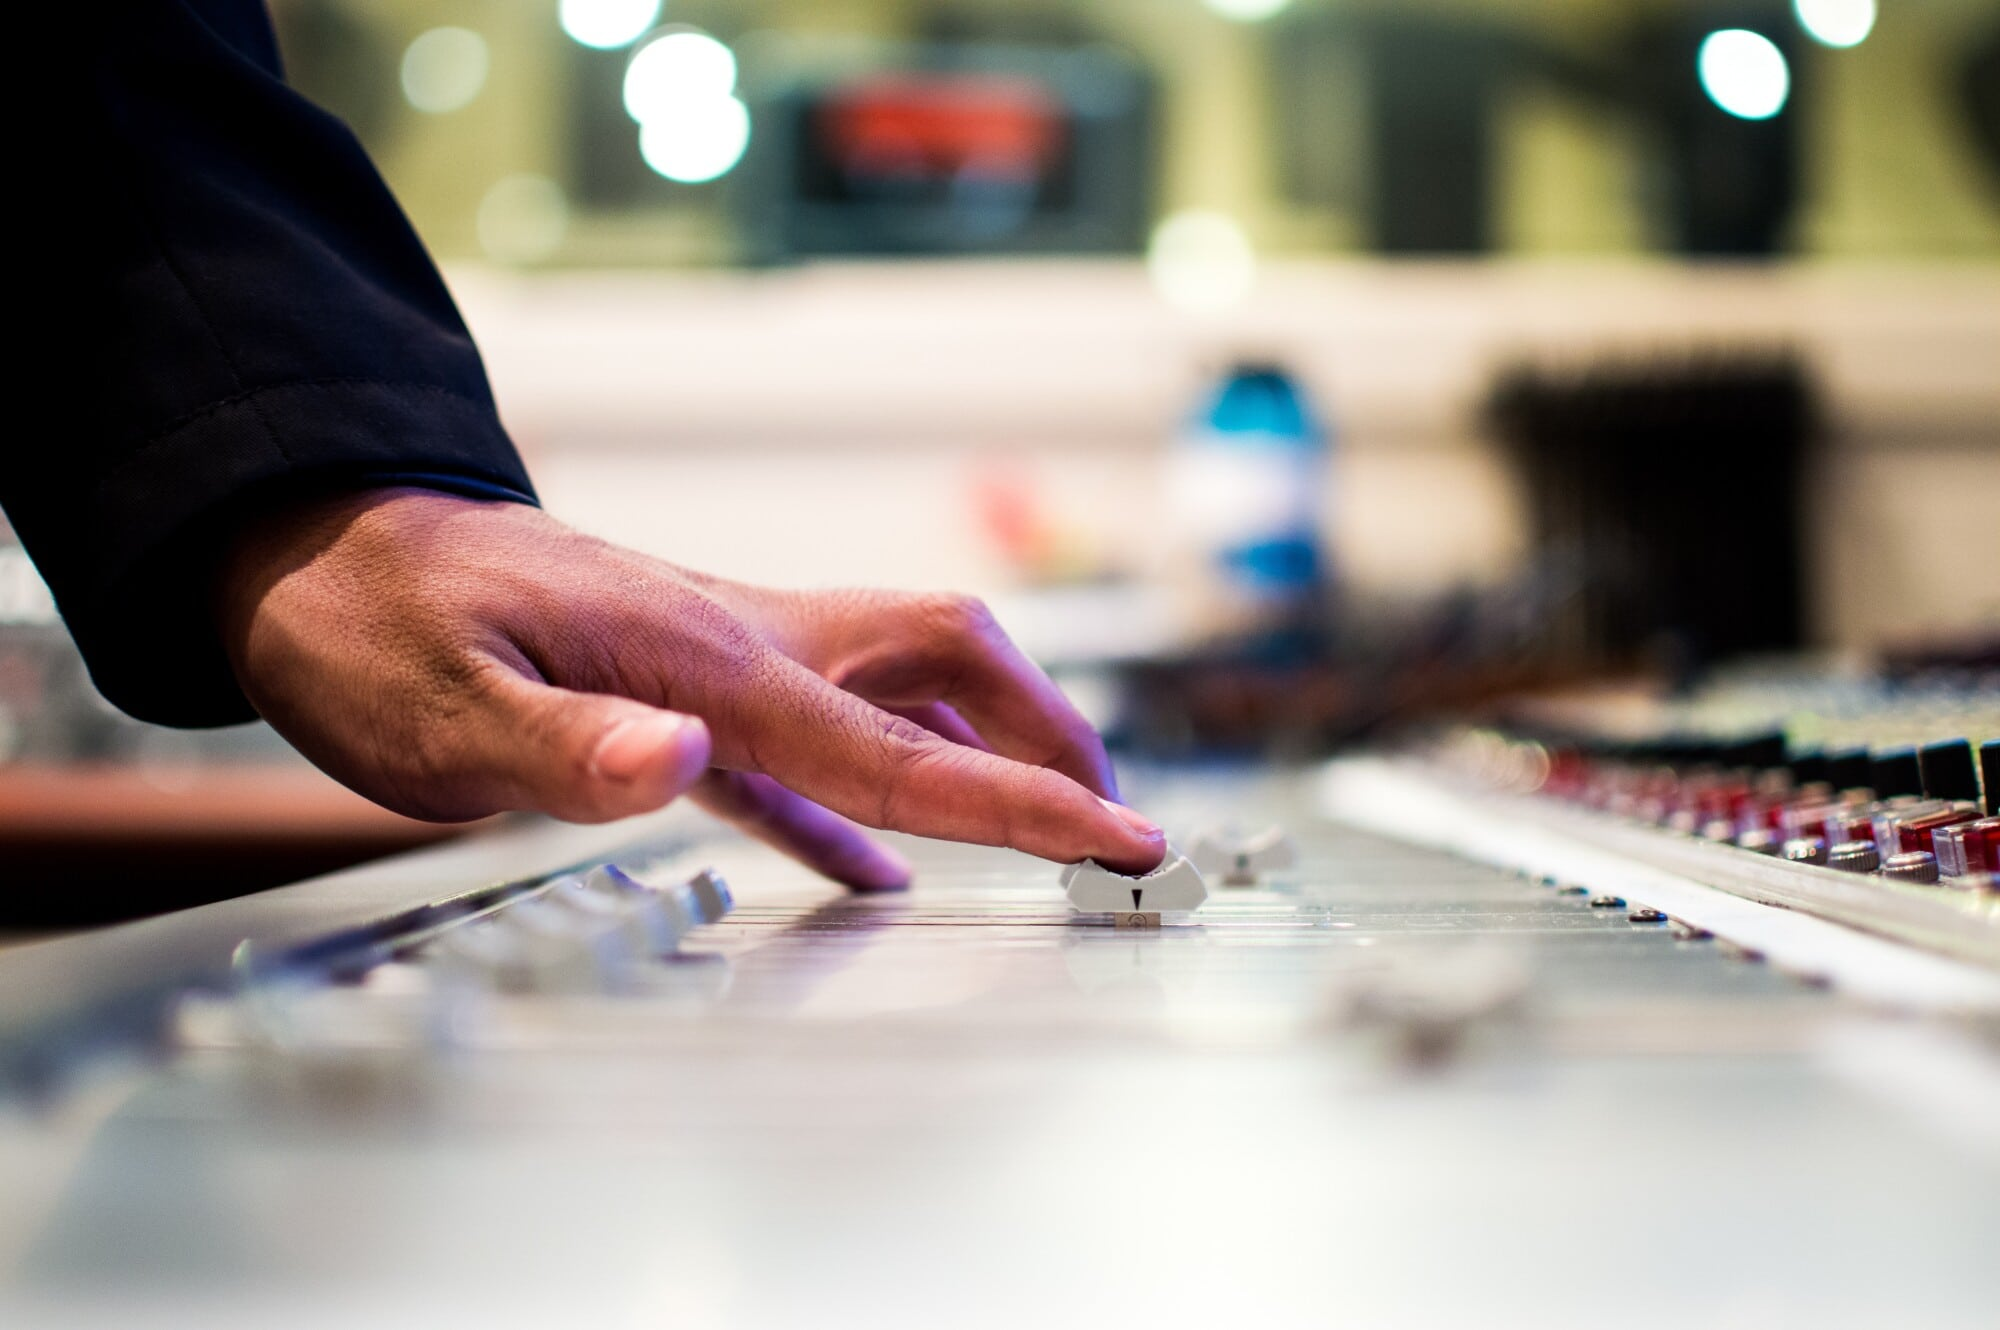 Wedding DJ conducting a sound check on the sound board